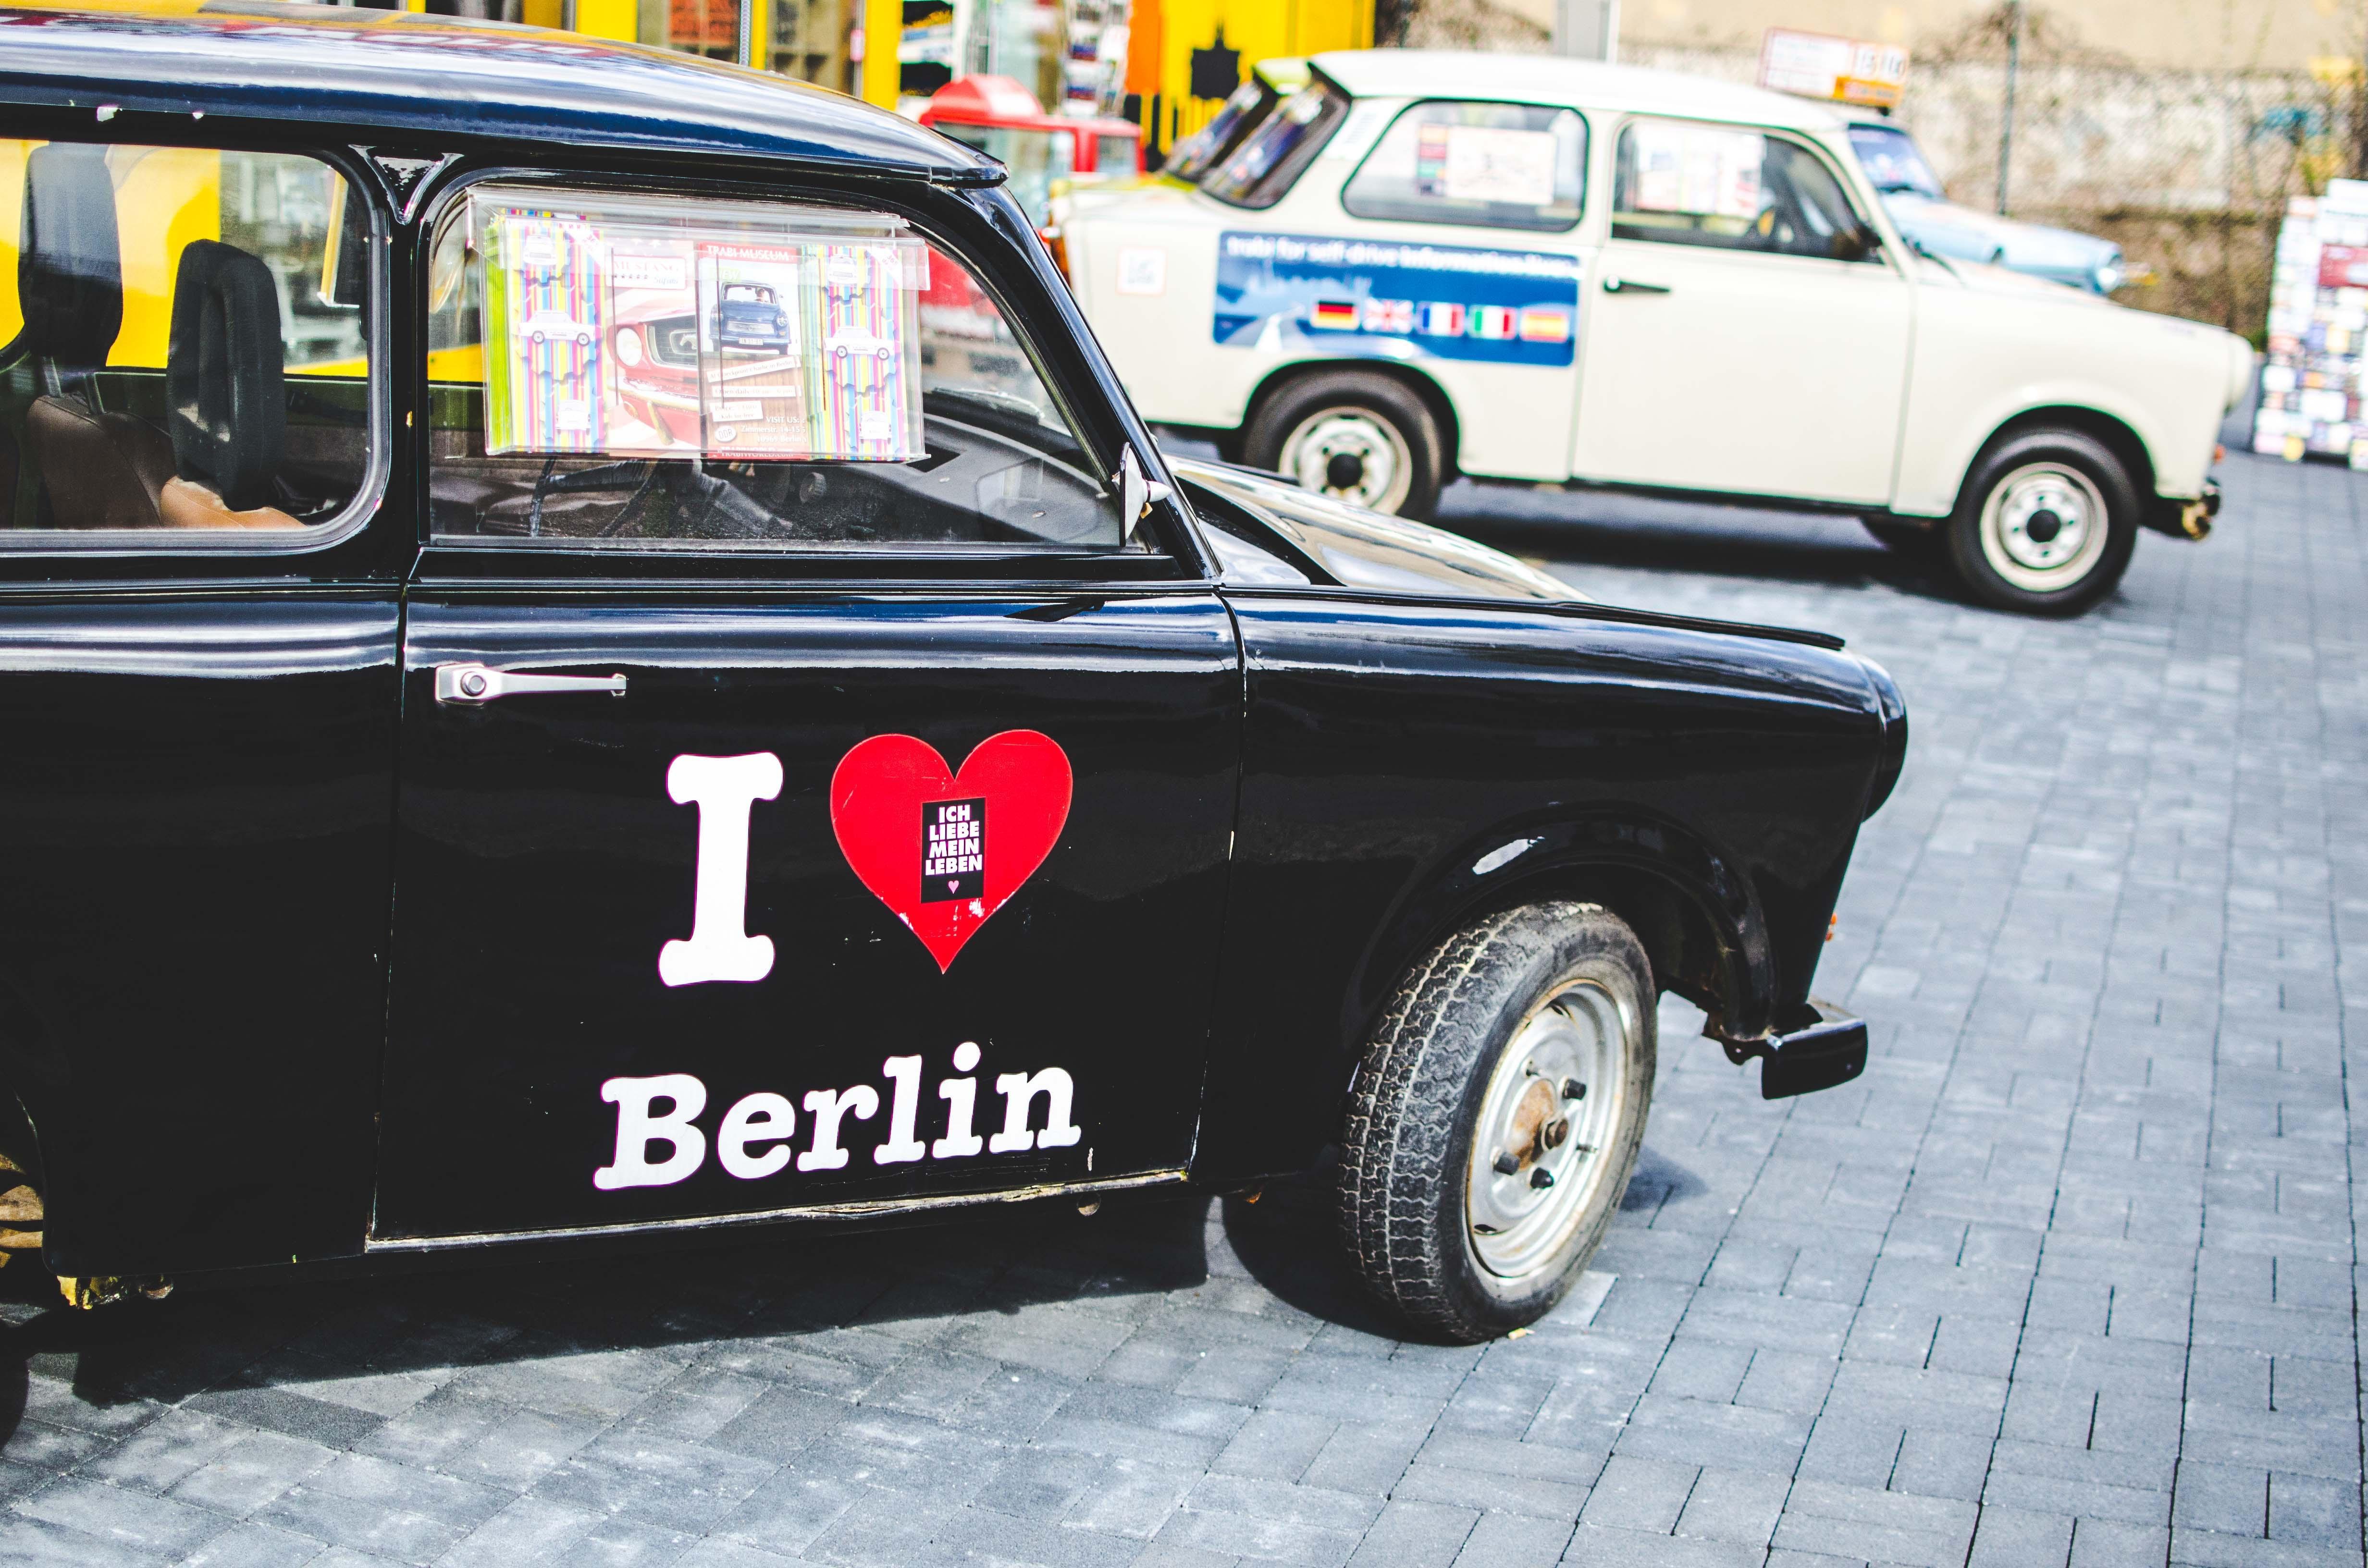 black single cab pickup truck